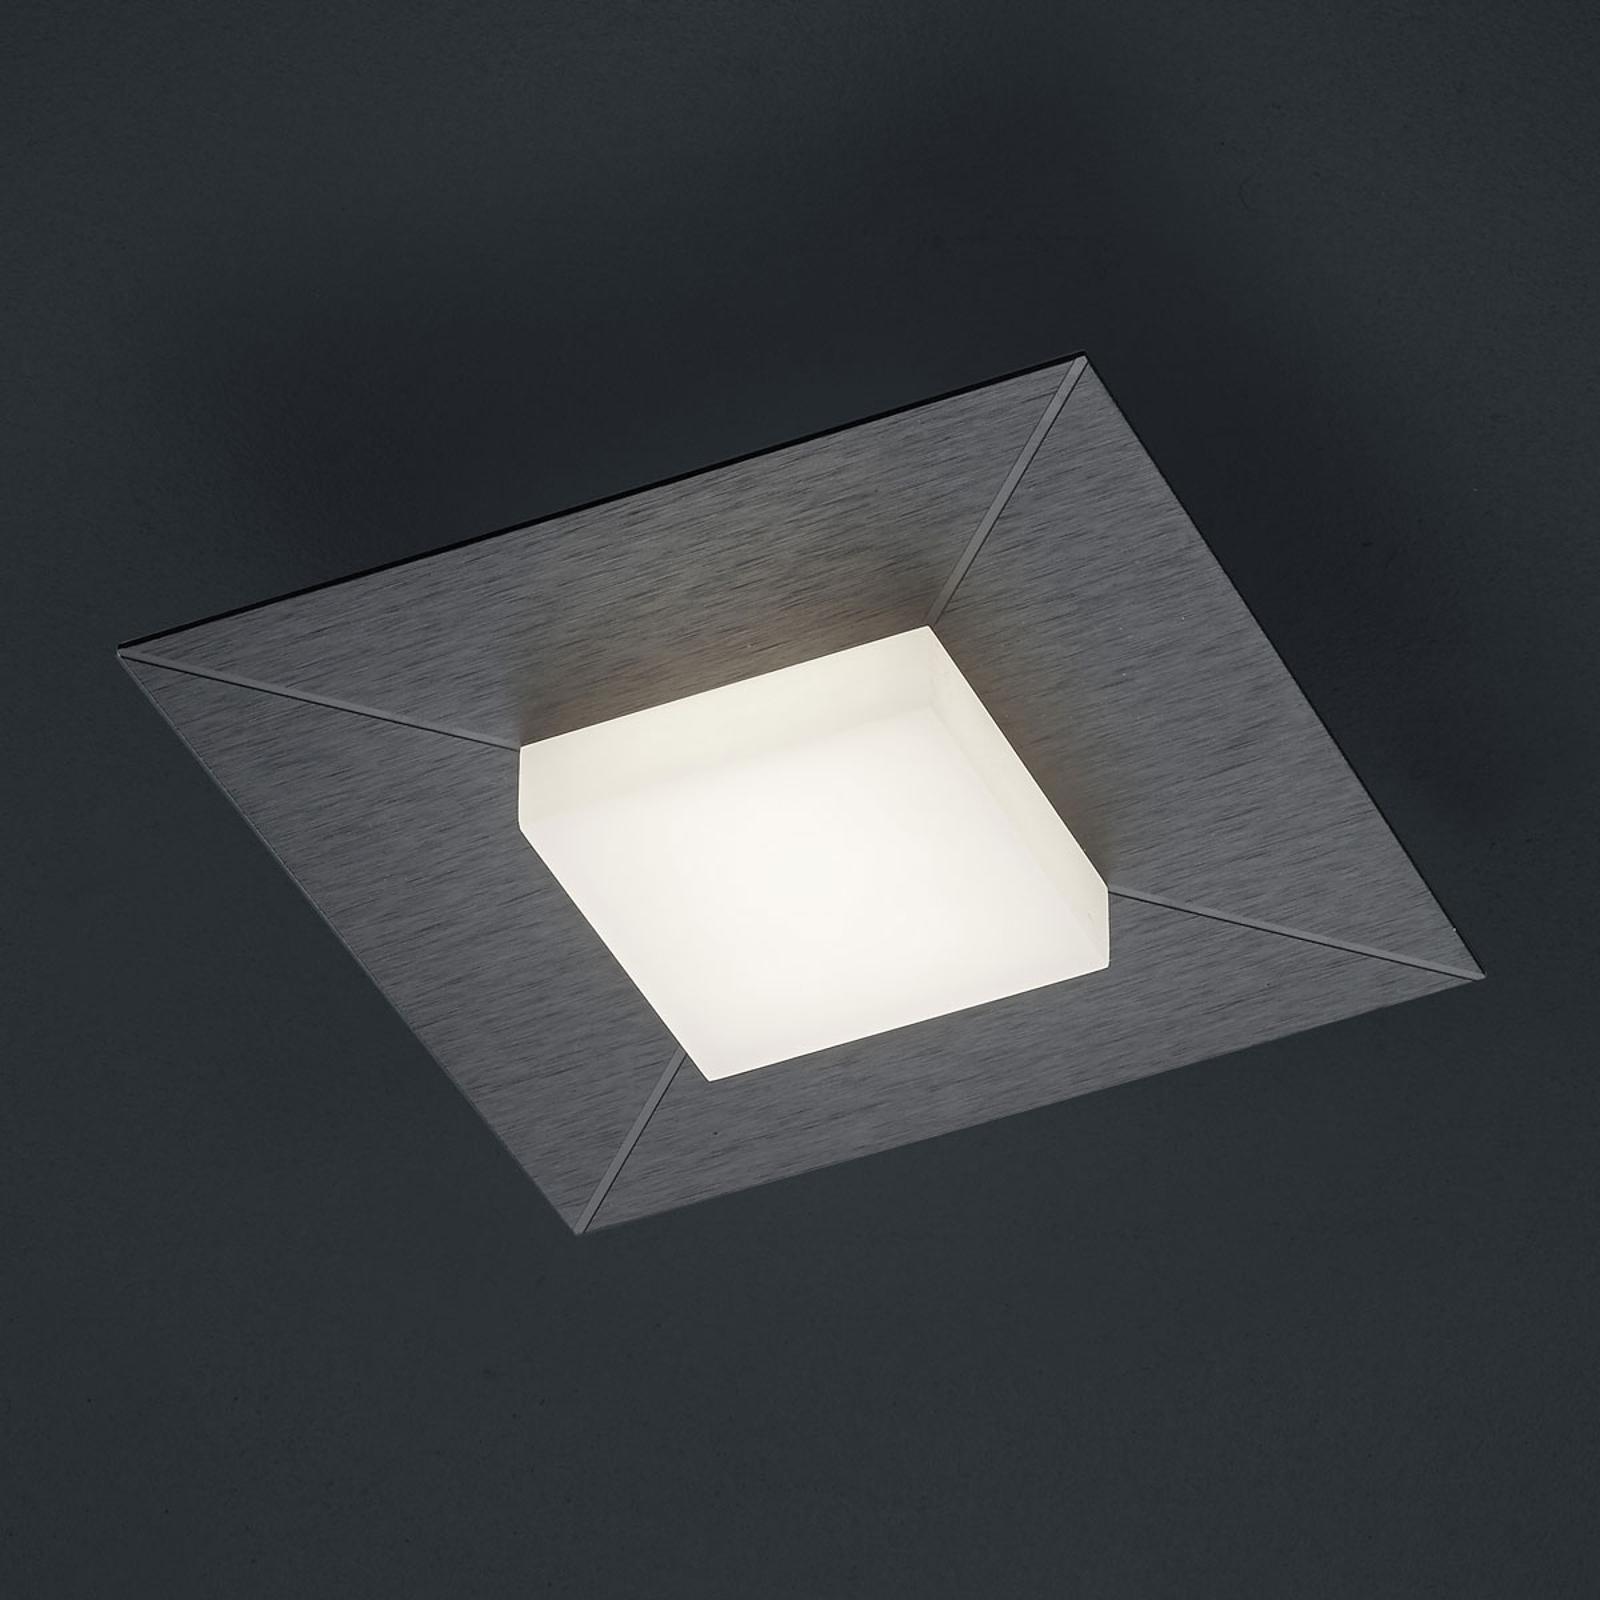 BANKAMP Diamond lampa sufitowa 17x17cm, antracyt